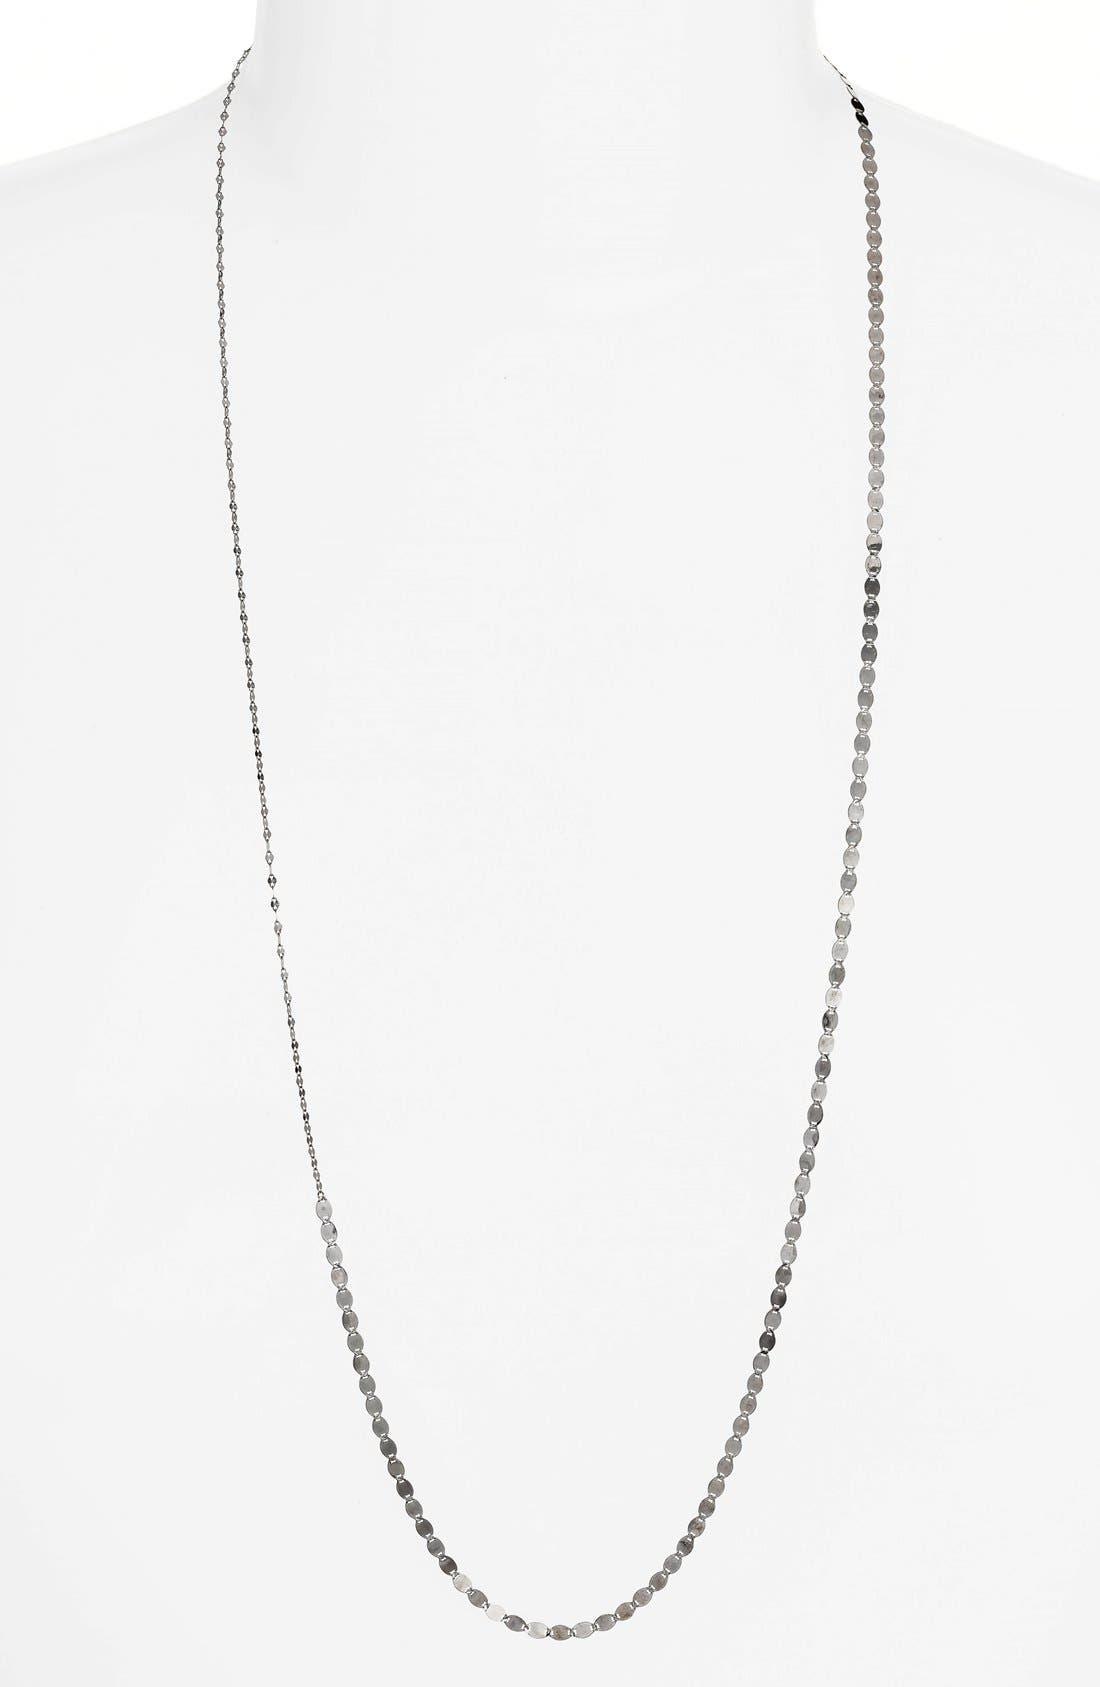 Main Image - Lana Jewelry 'Long Vanity' Strand Necklace